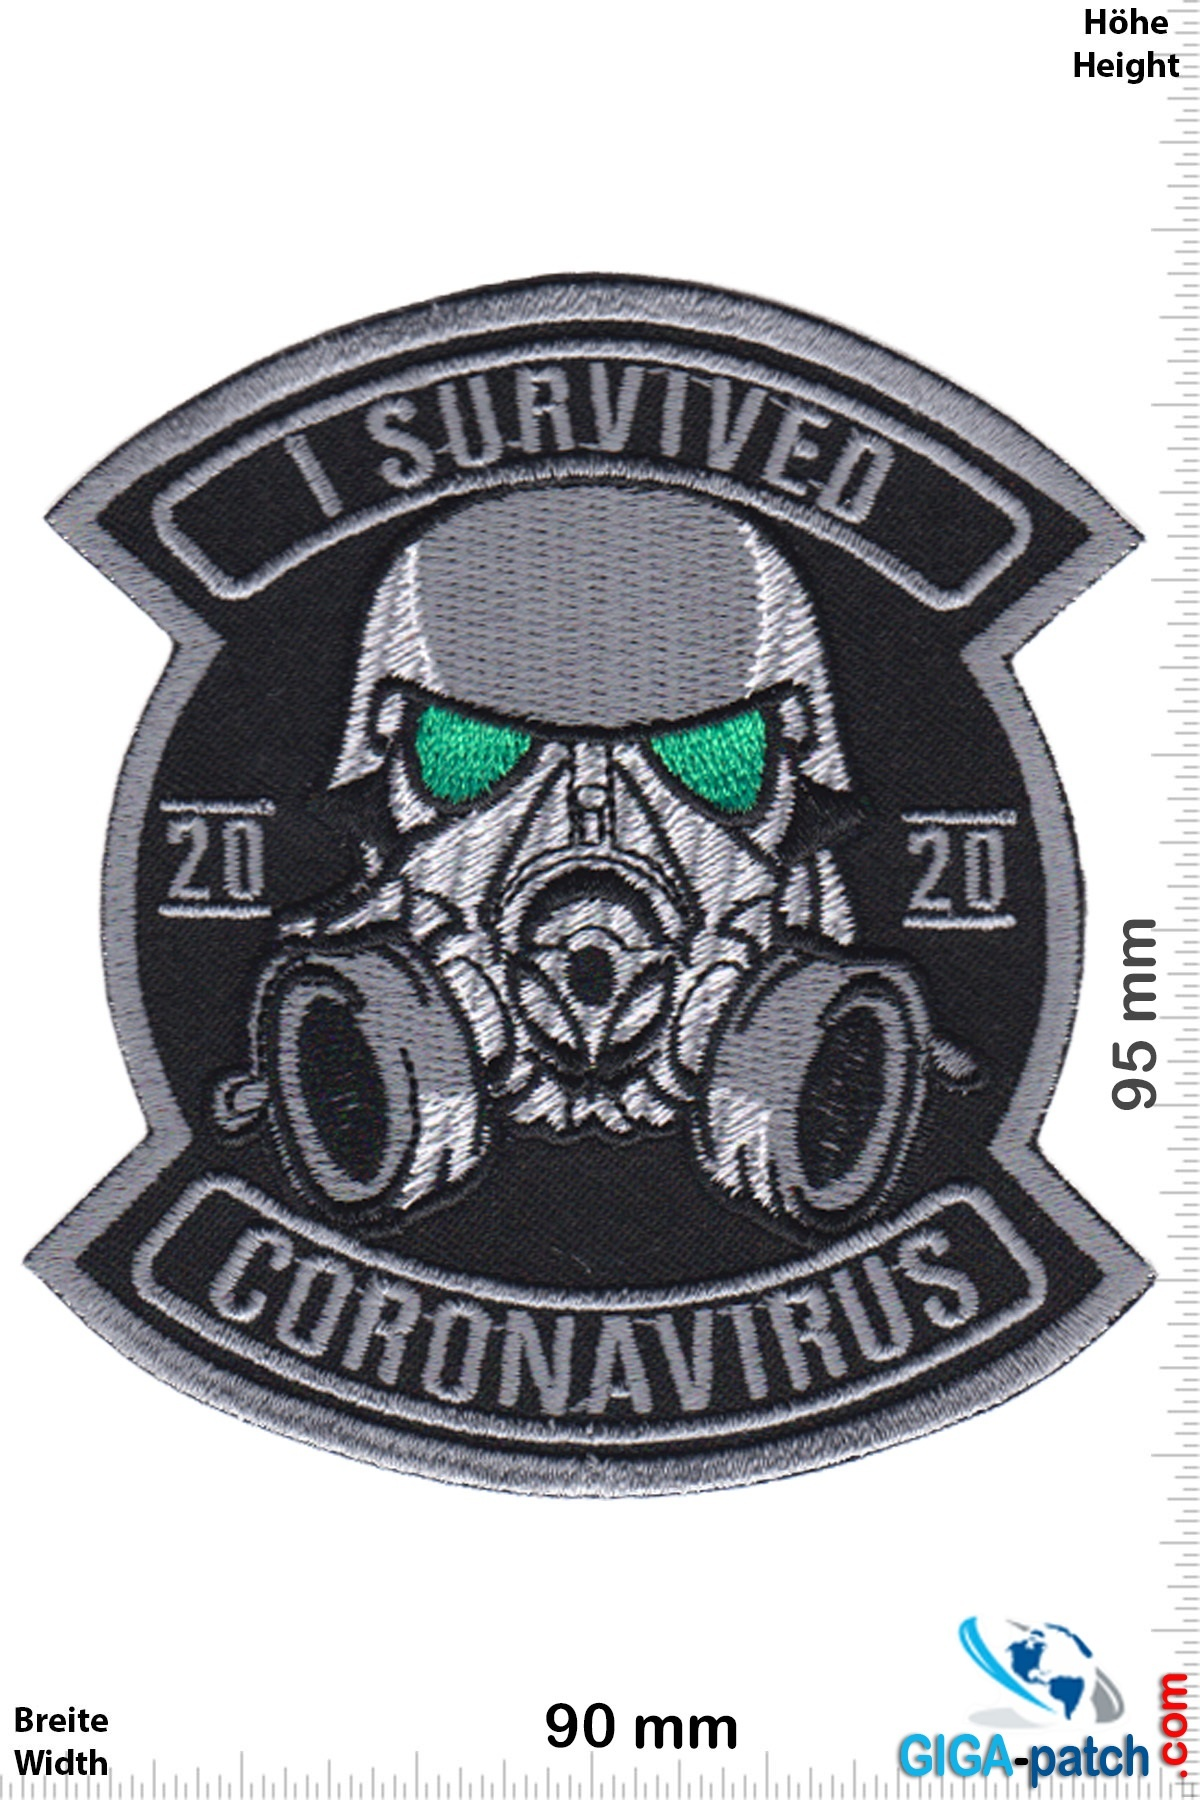 I Survived - 2020 Coronavisurs - Mask -  Corona Virus - Covid 19